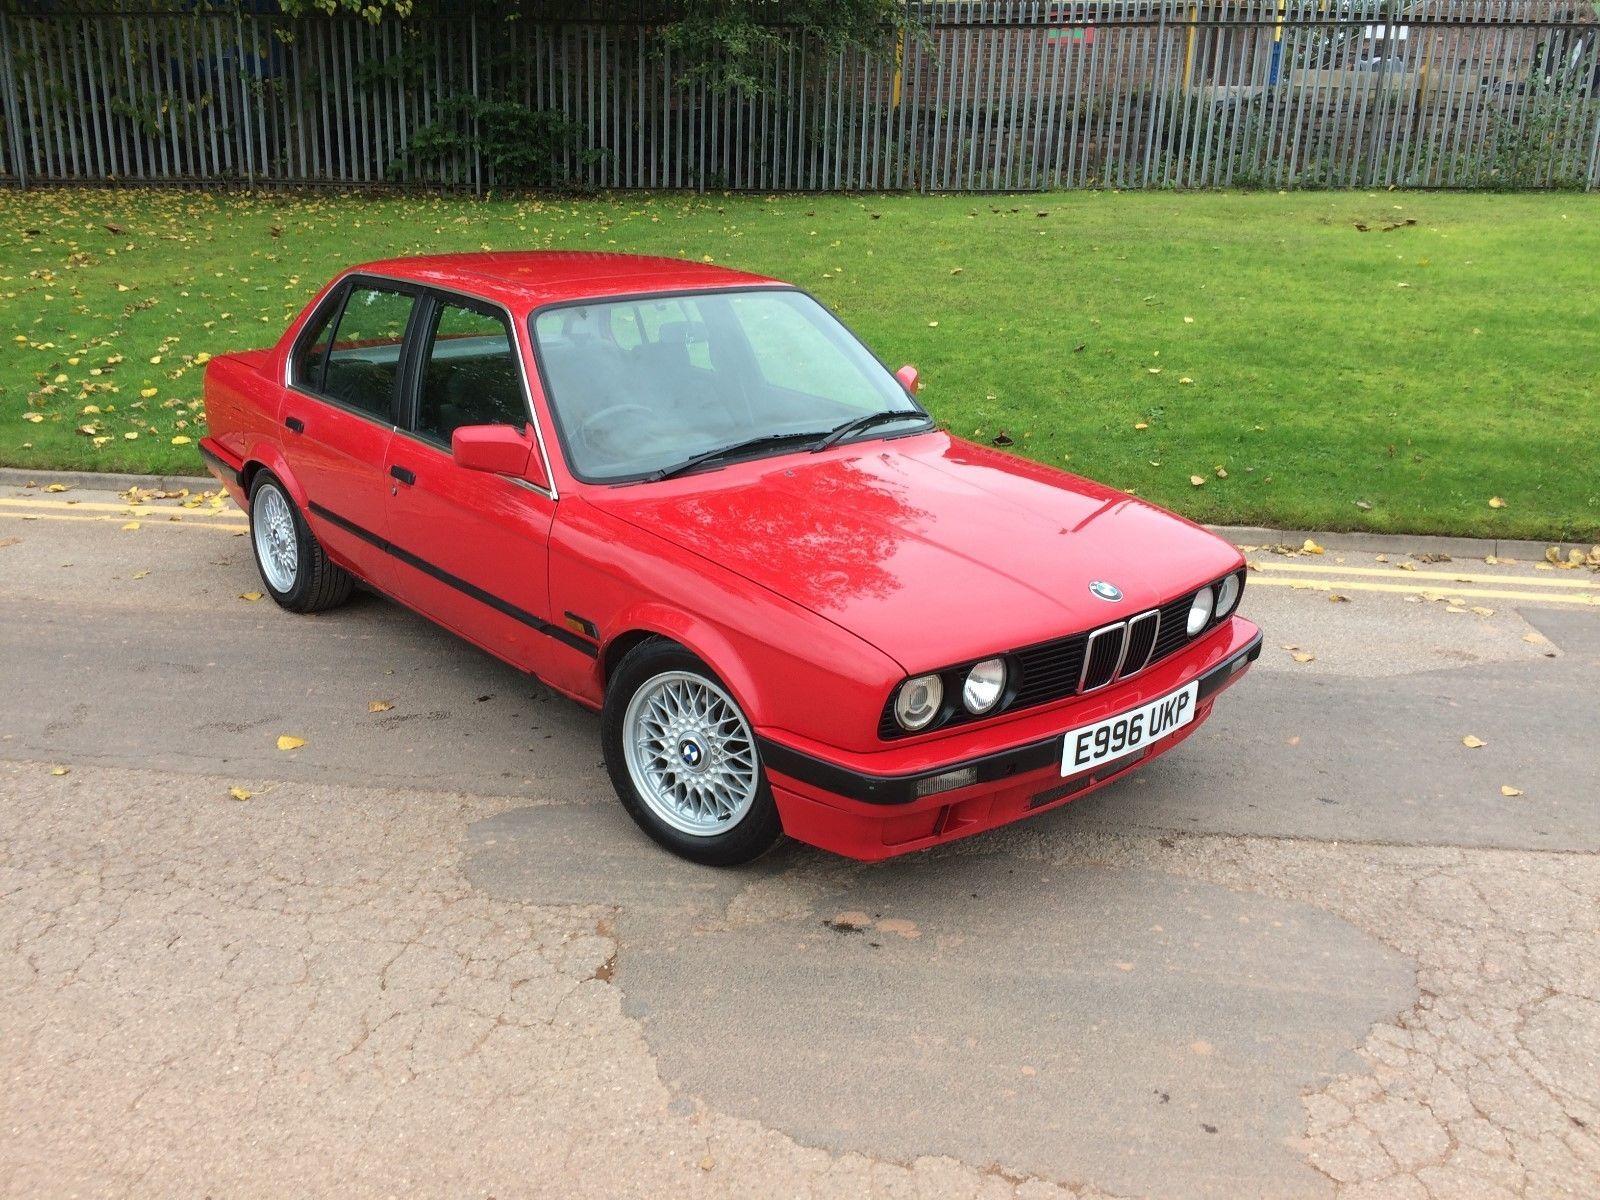 eBay: 1987 BMW E30 2.8 M52 CONVERTED FAST ROAD DRIFT CAR SLEEPER ...